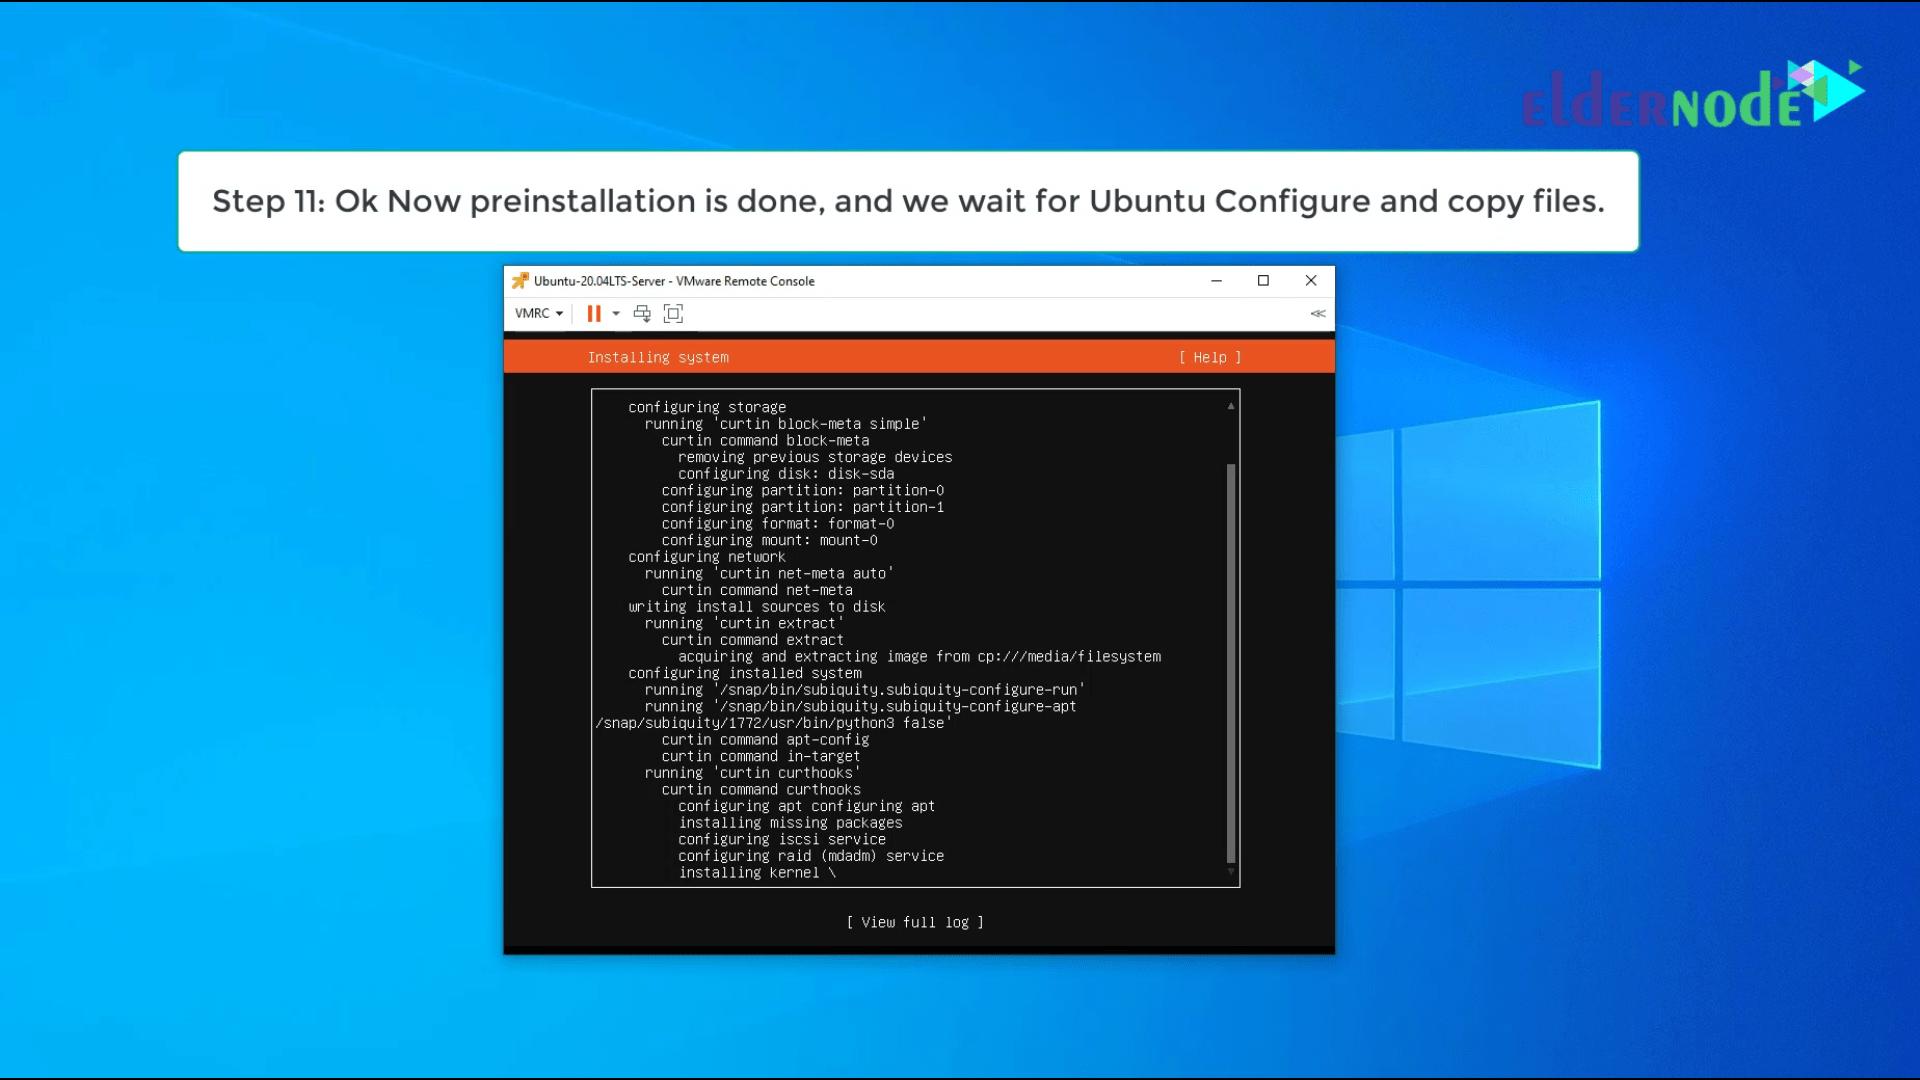 Install Ubuntu 20.04 LTS on vmware-11